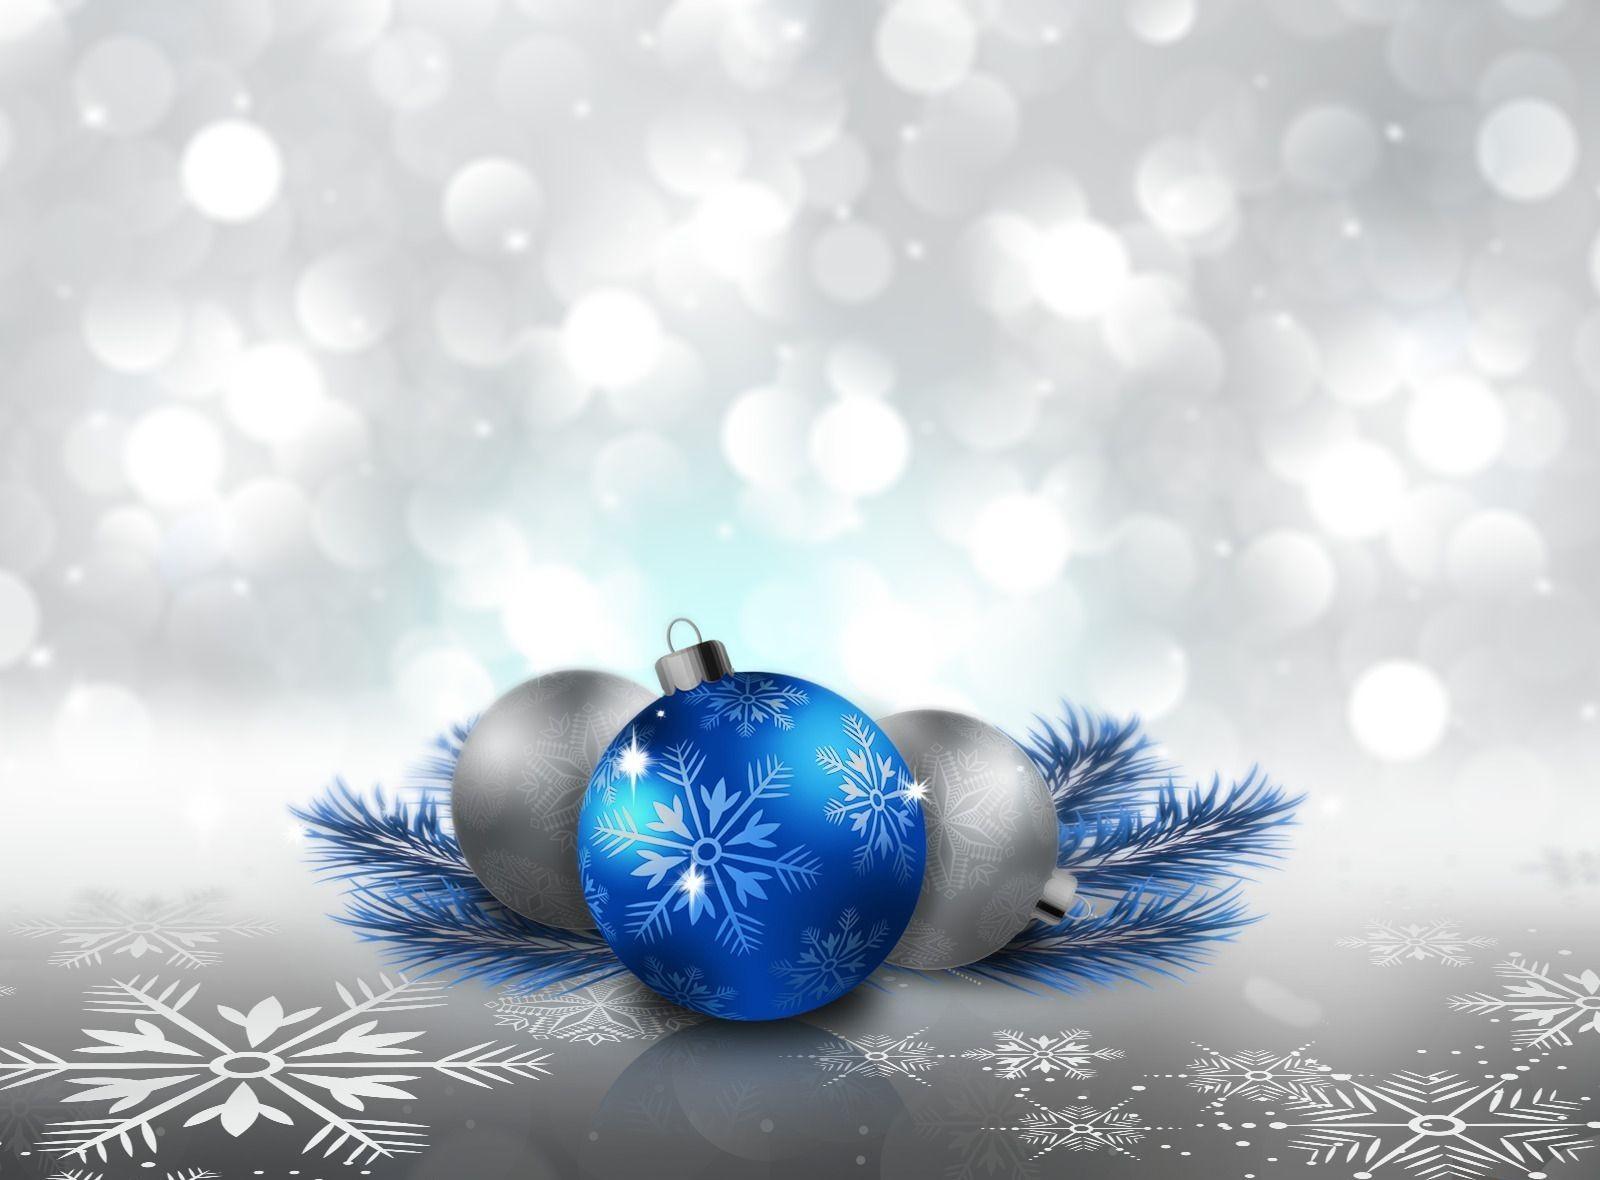 Fondos de pantalla esfera rama azul circulo navidad copos de nieve agujas bolas pelota - Blaue christbaumkugeln ...